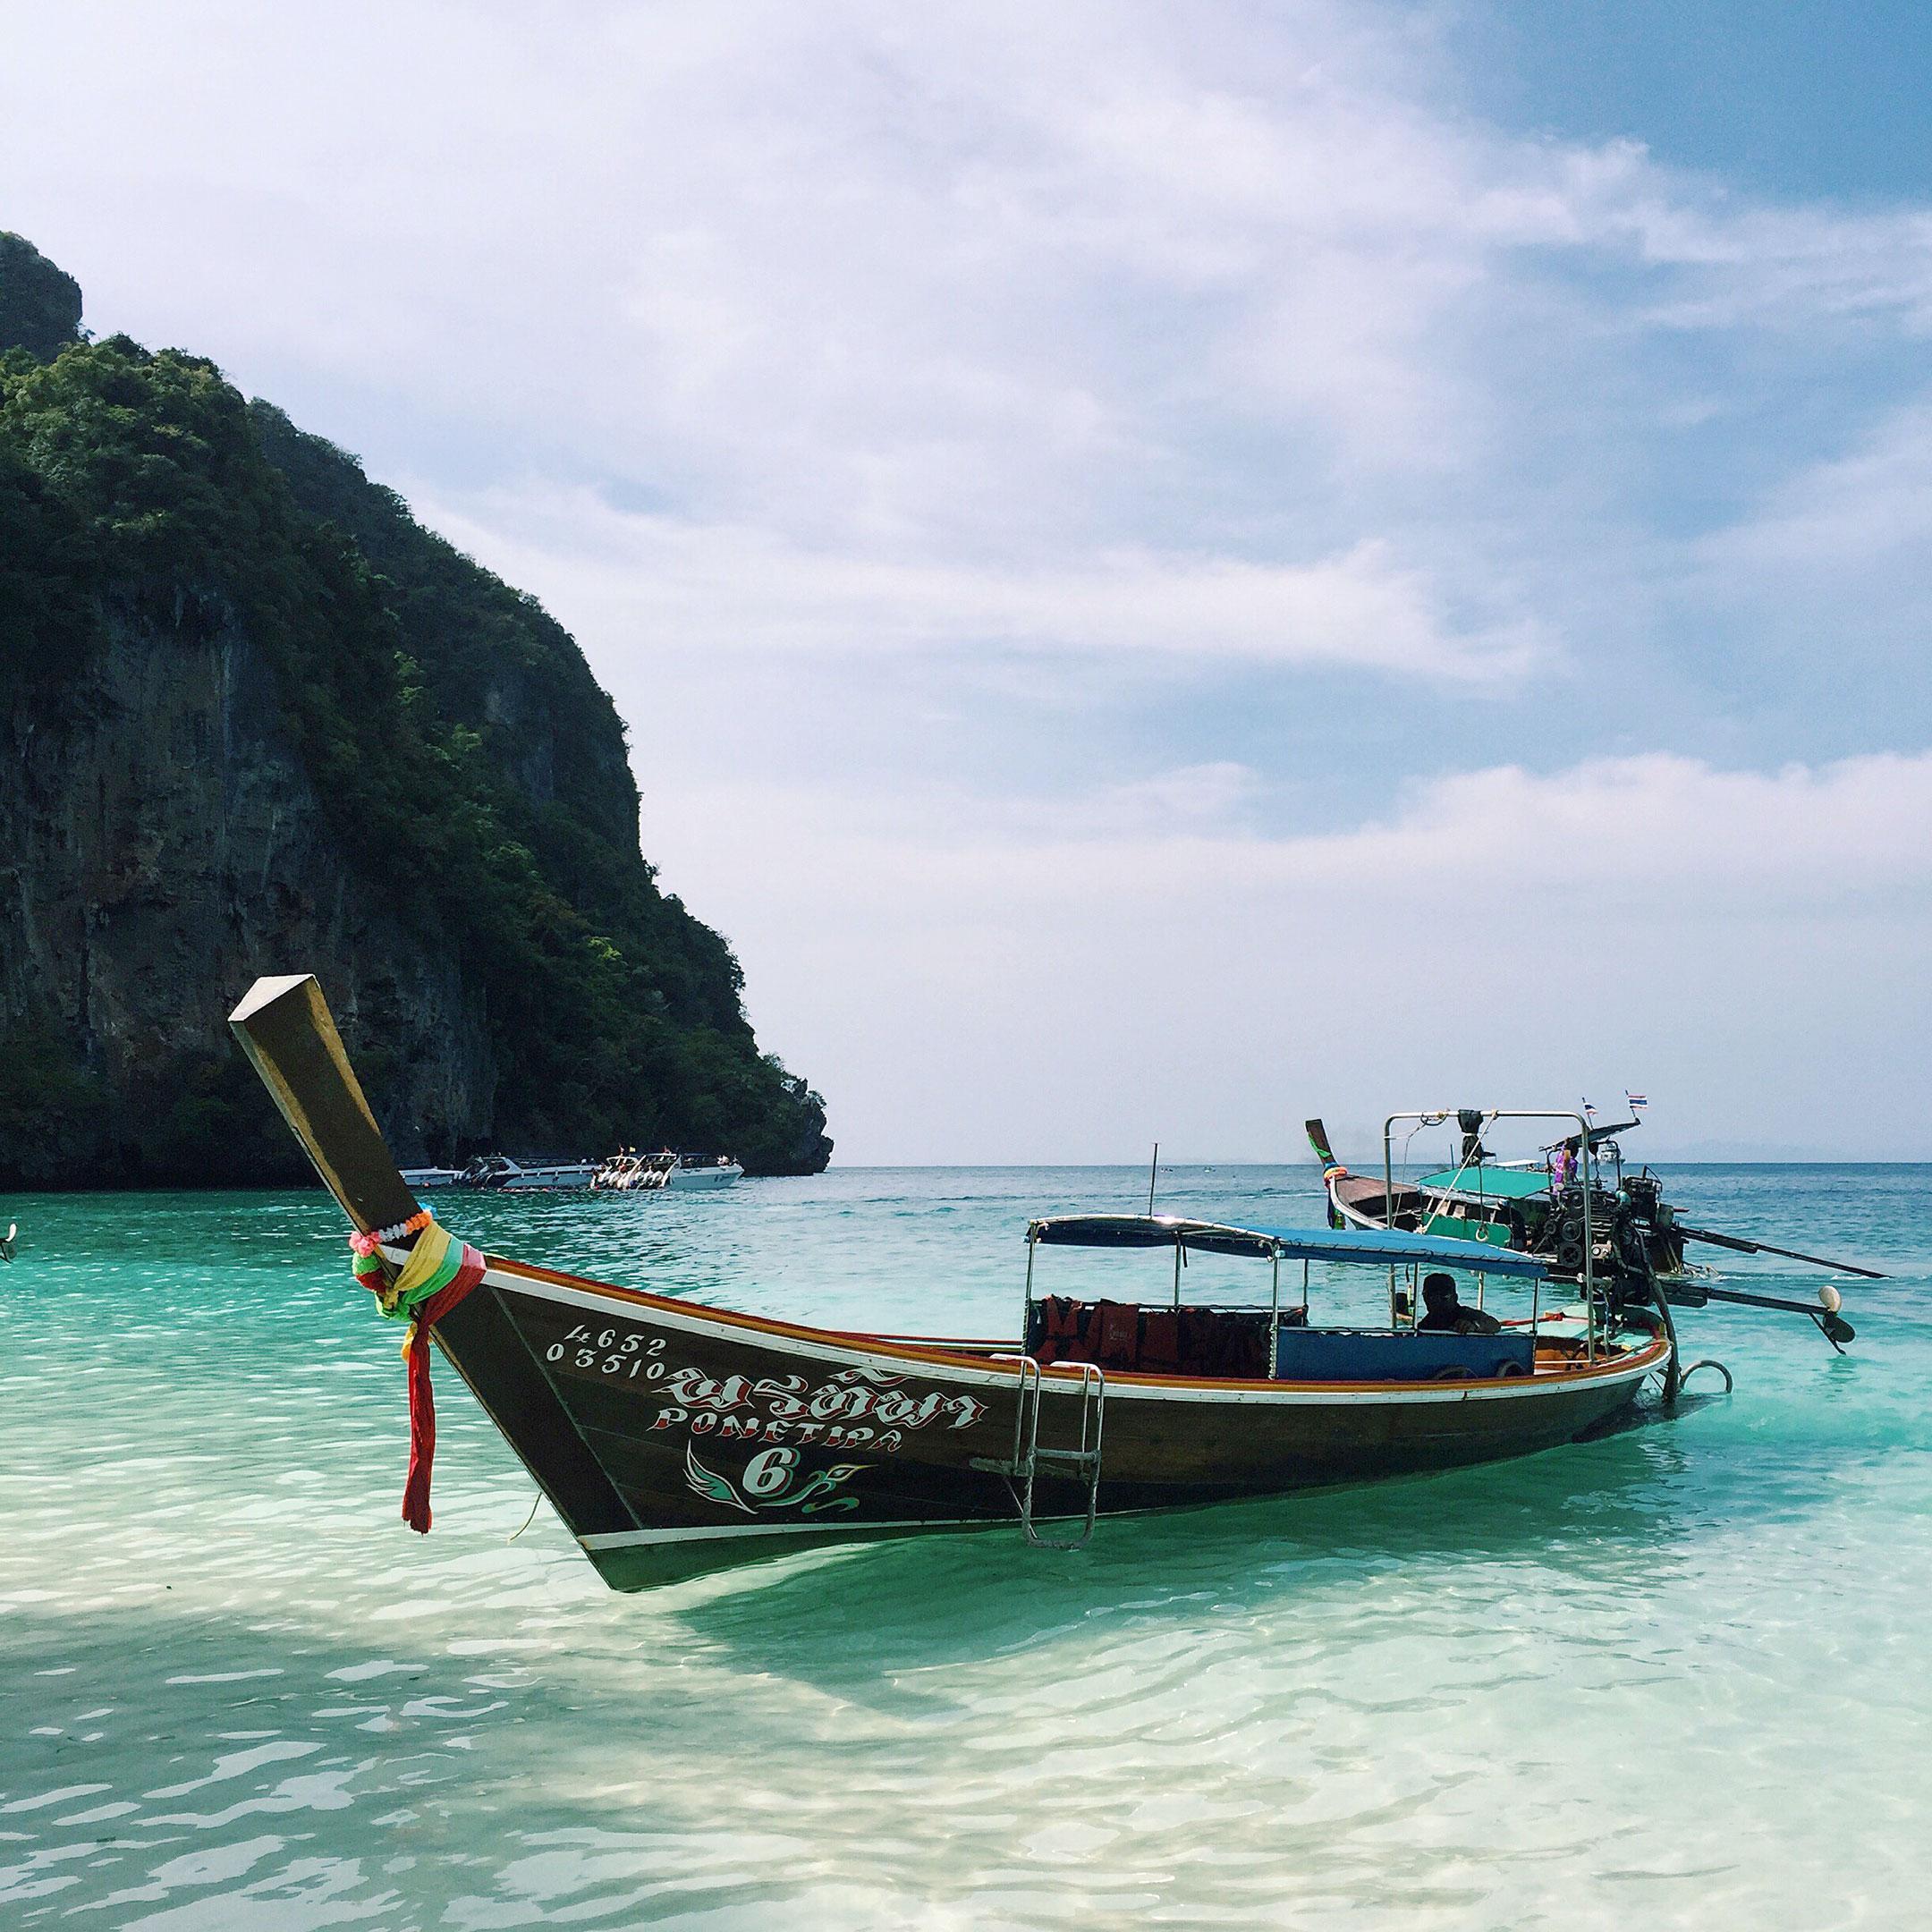 Boat docked in the Phi Phi Islands